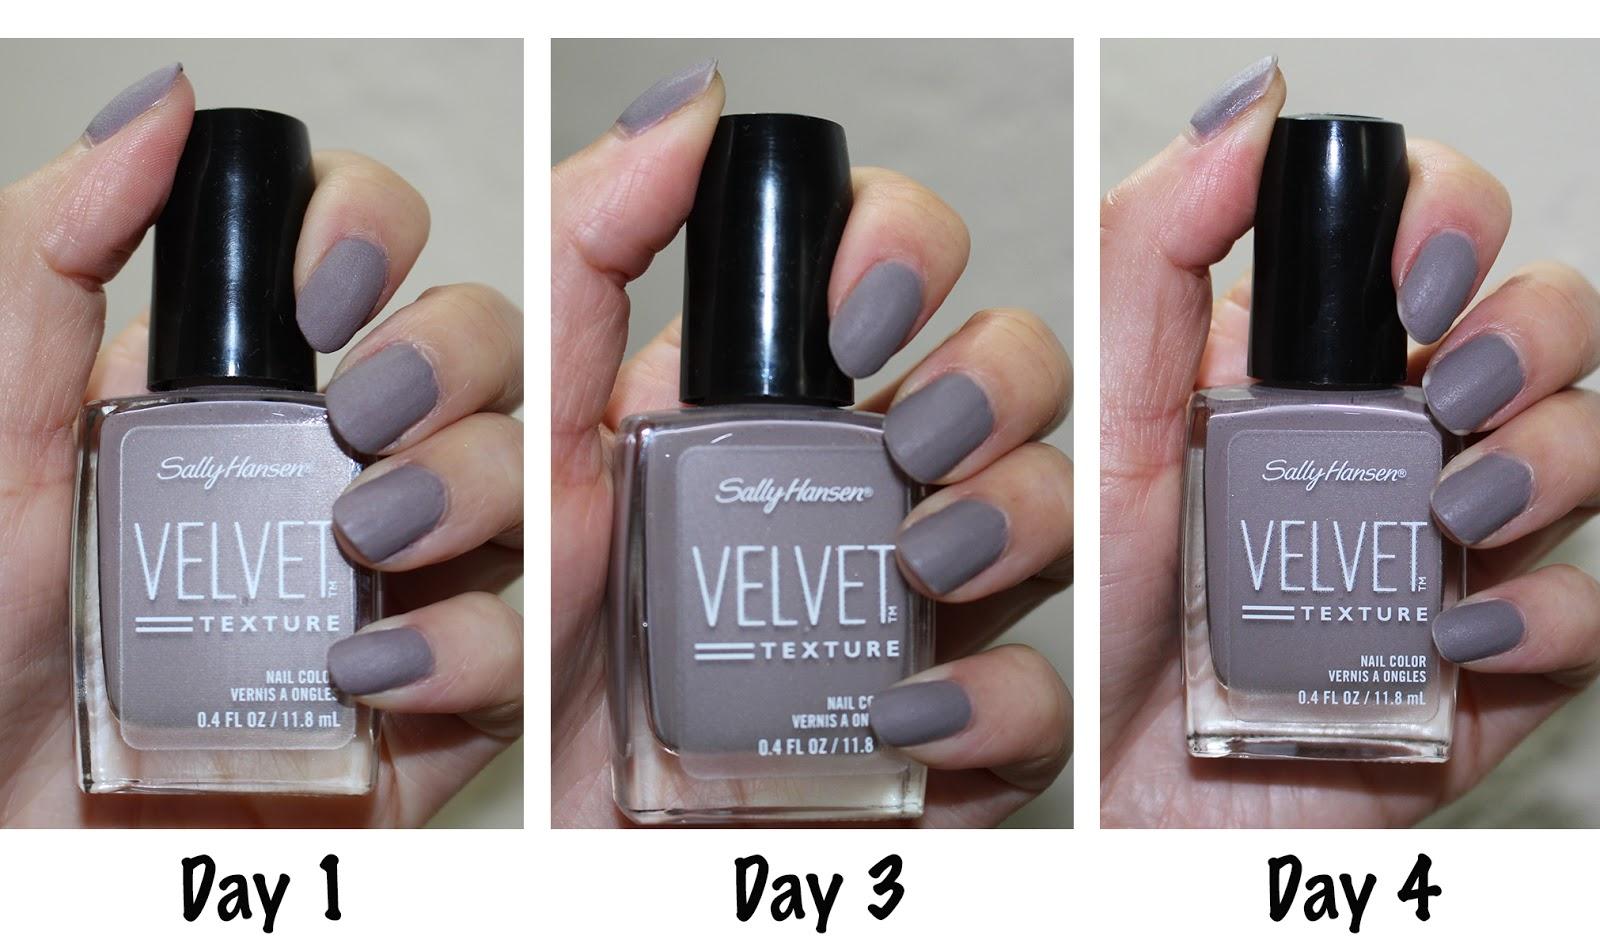 Nails: Sally Hansen Velvet Texture Nail Color in \